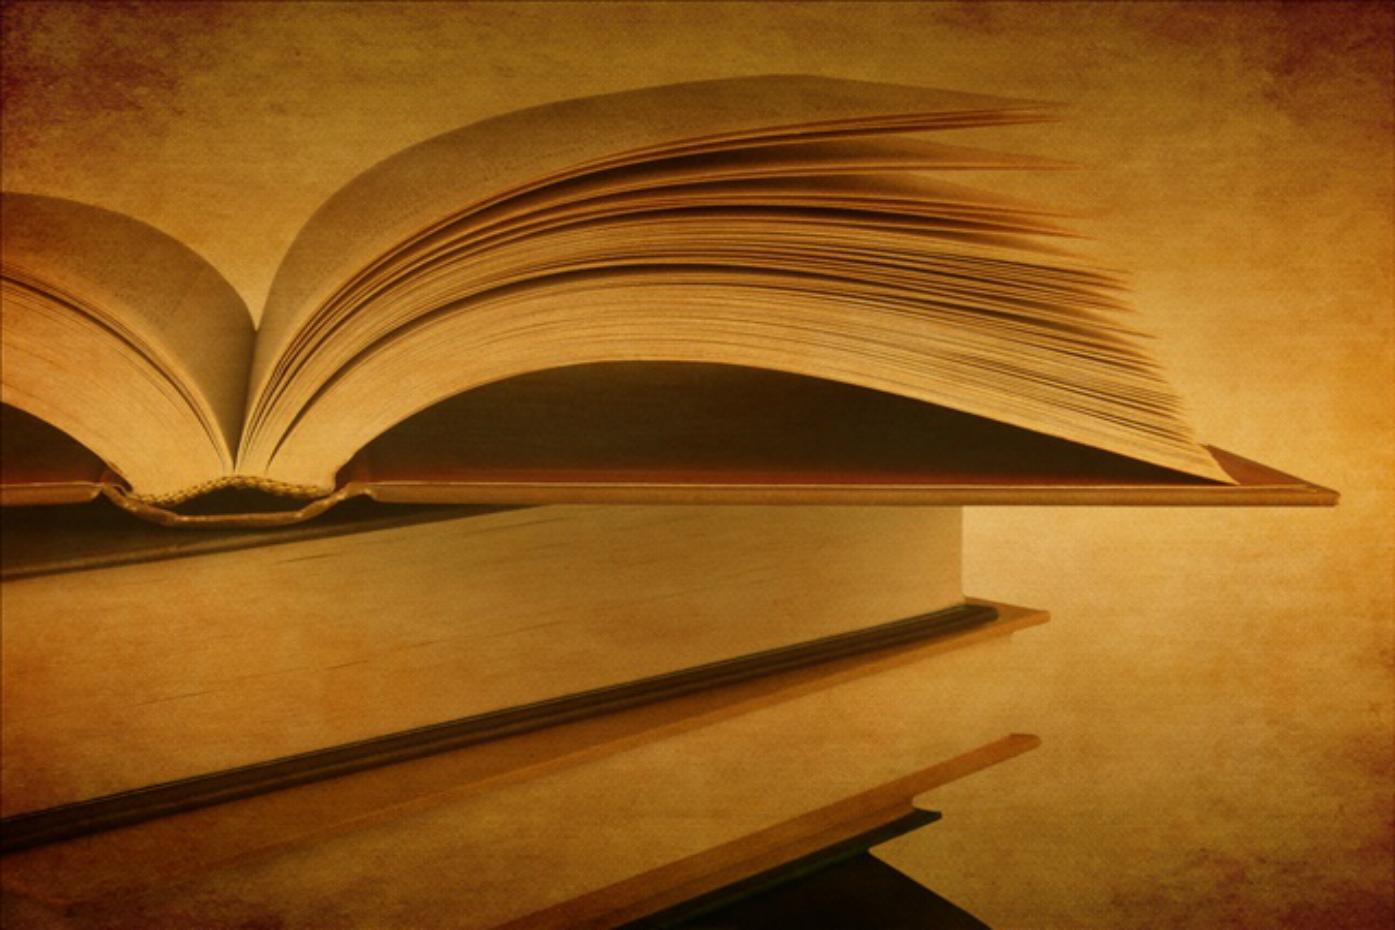 Books PLAS_1463714074545.jpg